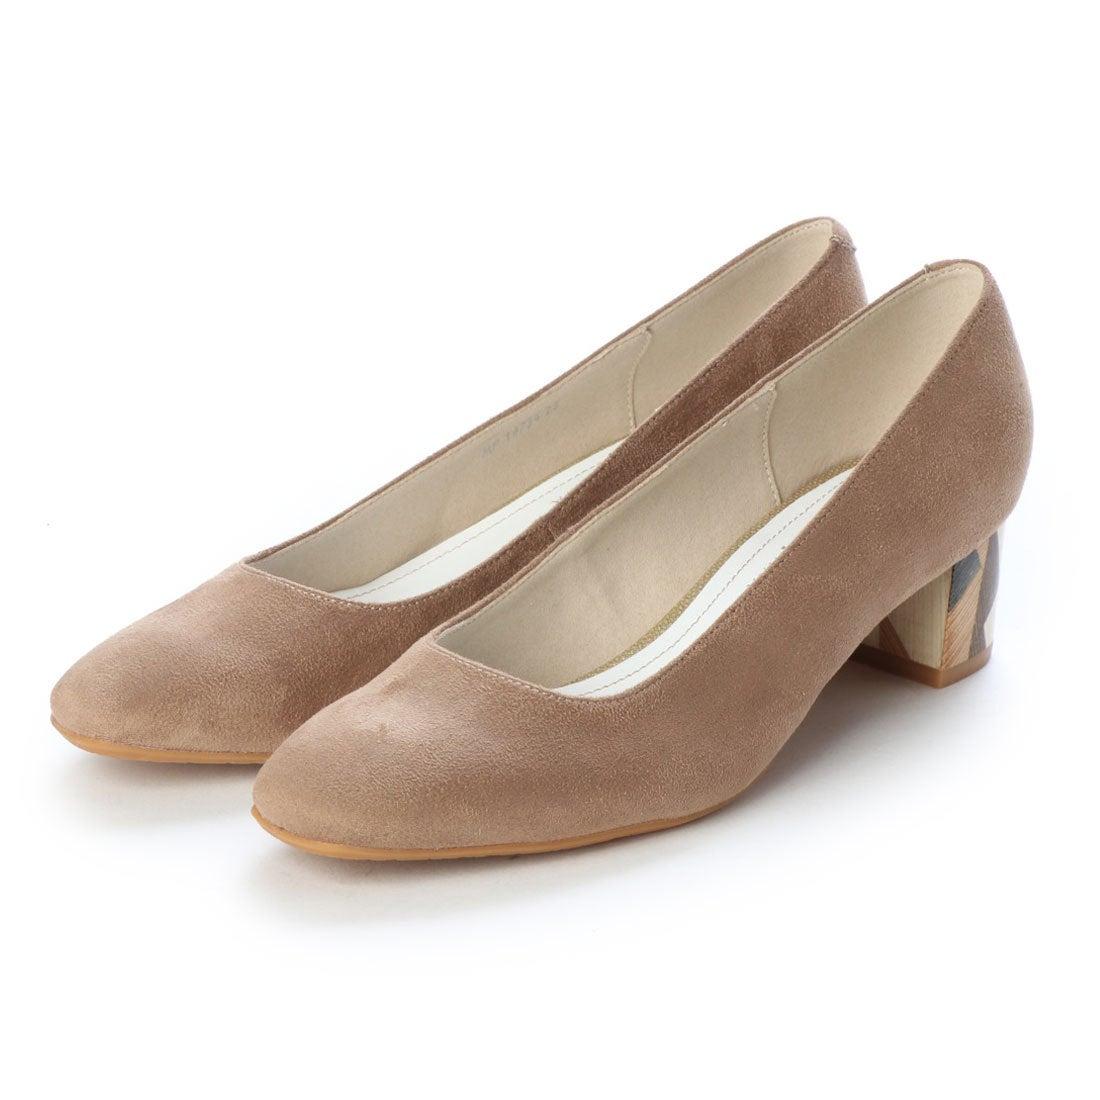 50e610fa11bf44 アルテミス バイ ダイアナ artemis by DIANA マルチカラーヒールパンプス (ベージュ合皮スエード) -靴&ファッション通販  ロコンド〜自宅で試着、気軽に返品